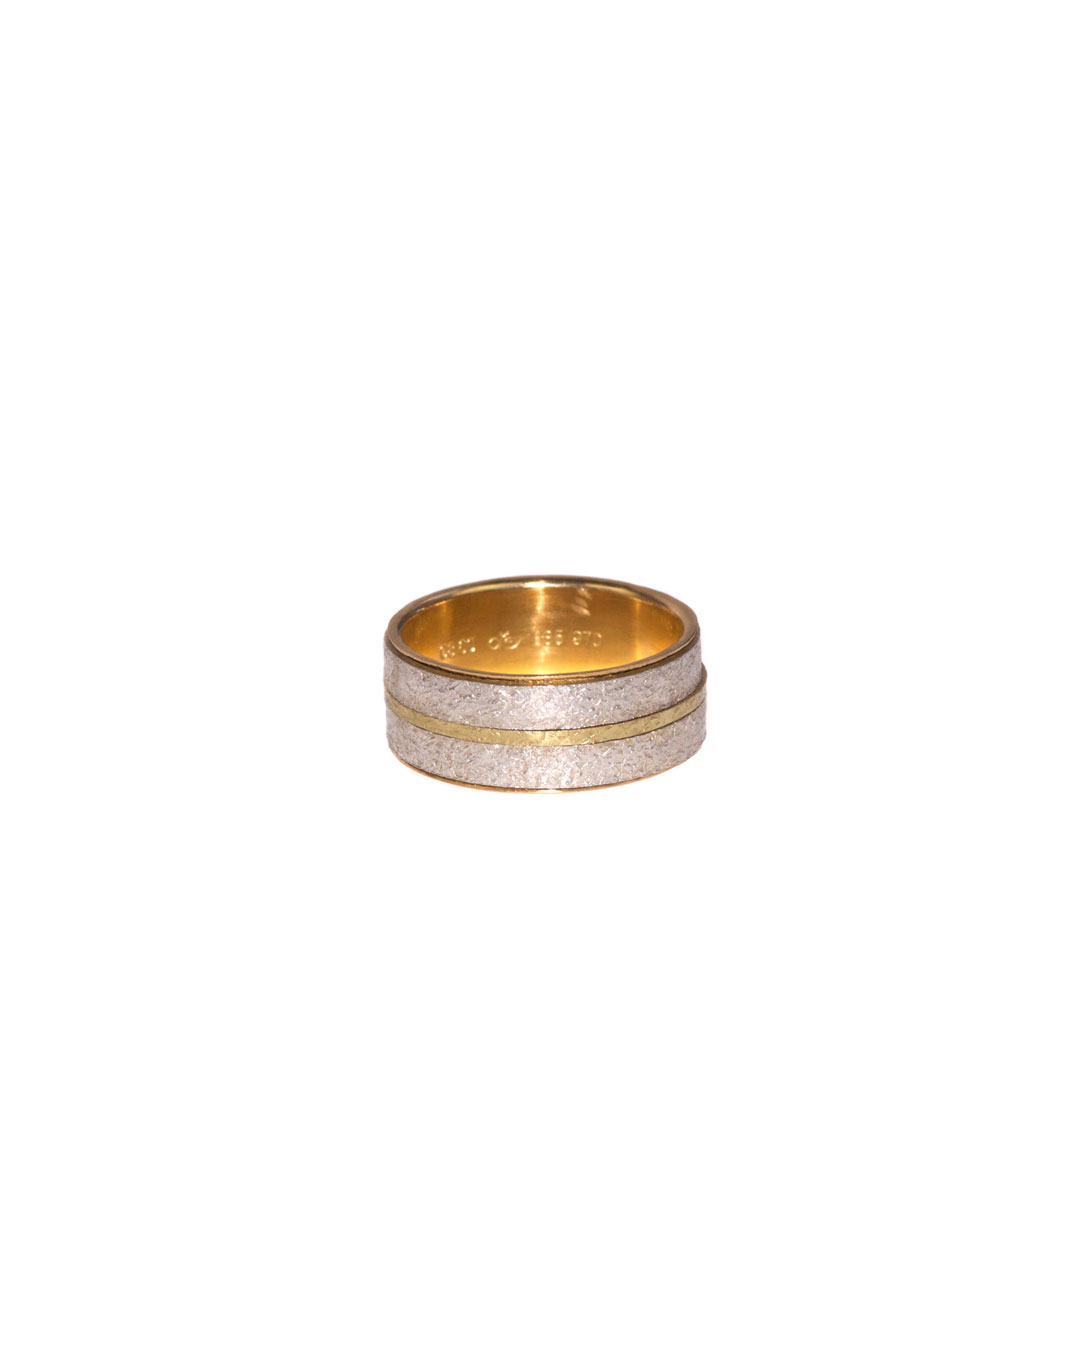 Okinari Kurokawa, untitled, 2008, ring; 20ct gold, 970 silver, 20 x 8 mm, €1600